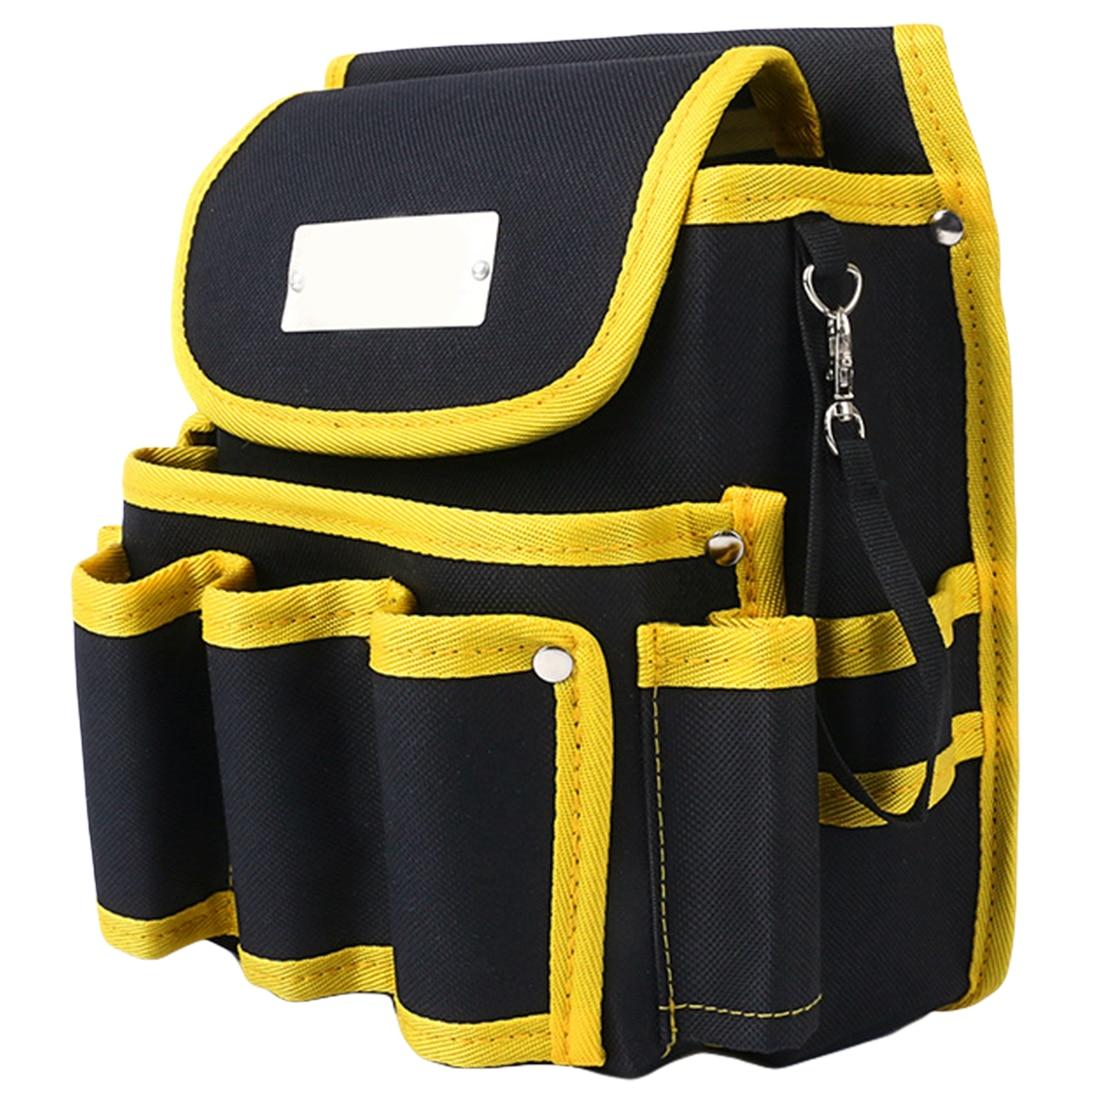 Adjustable Belt Pocket Pouch Telecommunications Holder Electrician 600D Water Proof Cloth Rivet Fixed Tool Bag 23 X 13 X 23cm